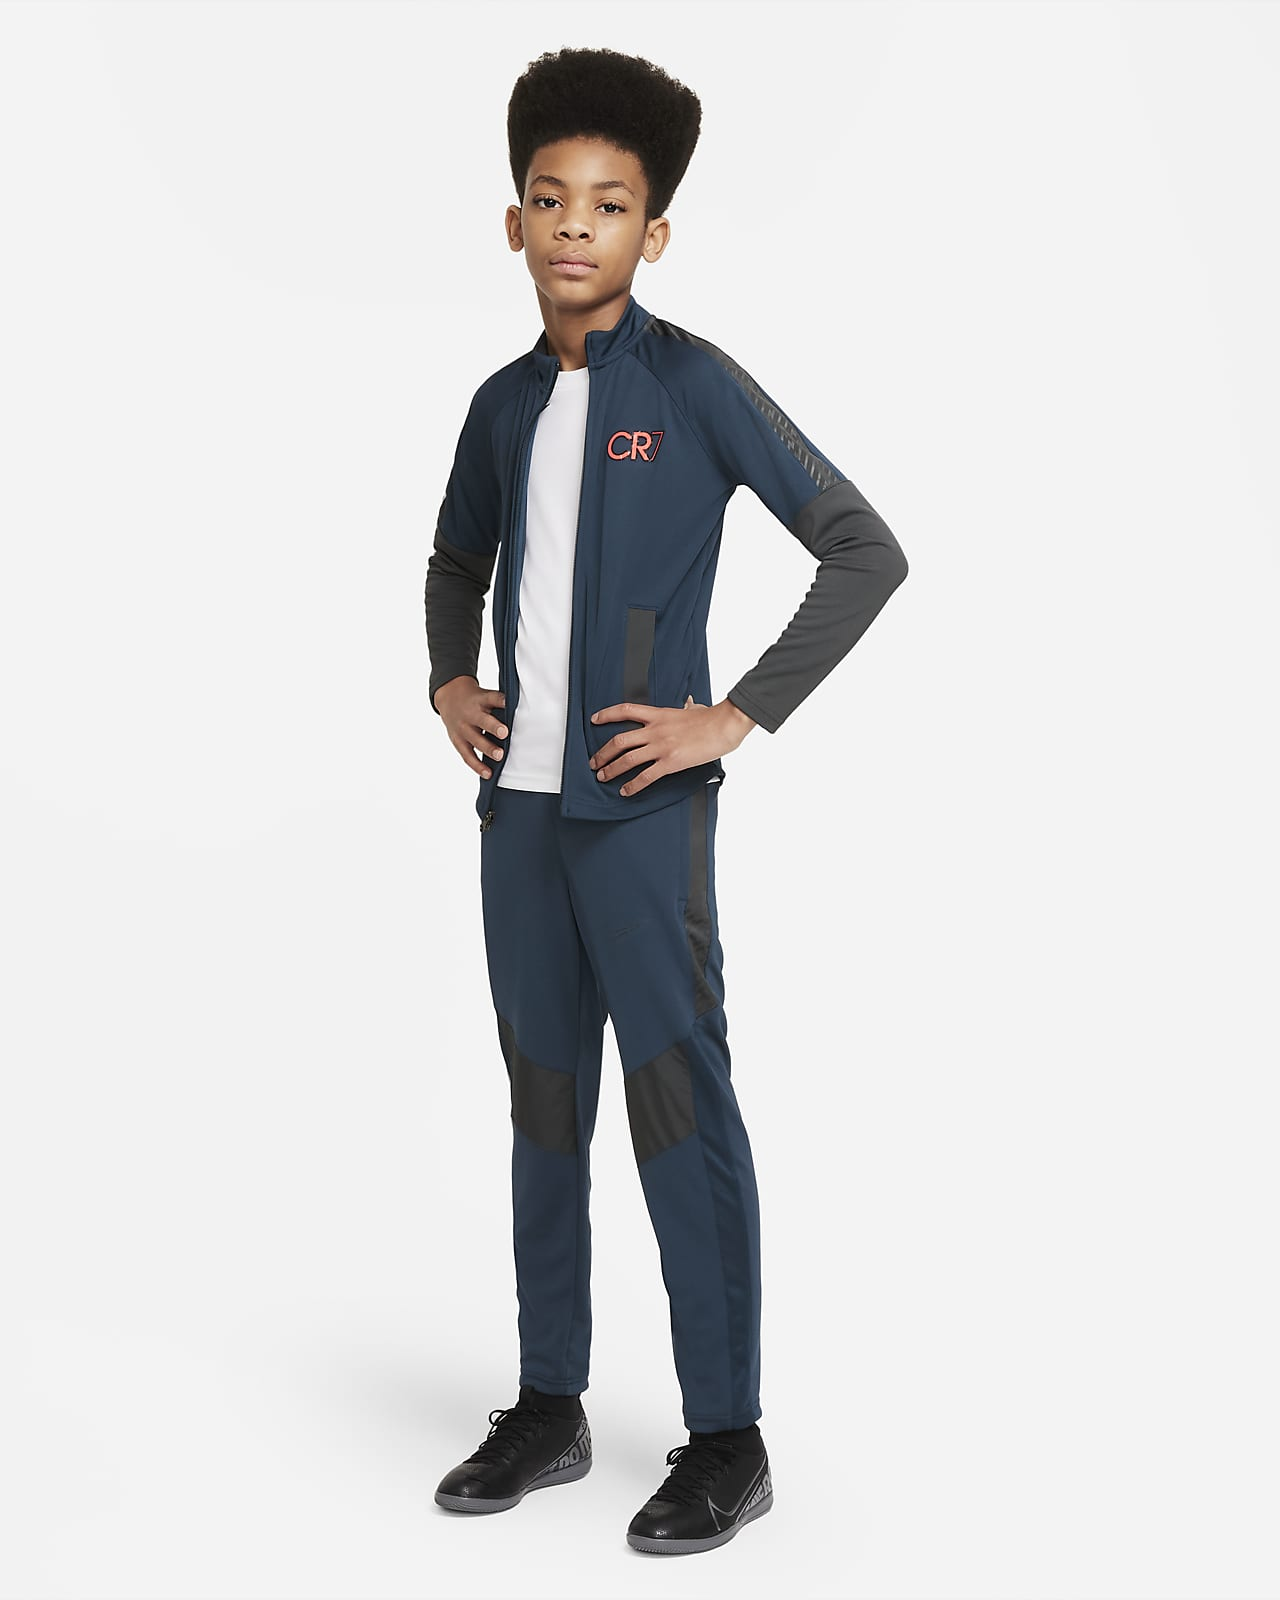 Nike Dri-FIT CR7 耐克C罗系列大童足球运动套装